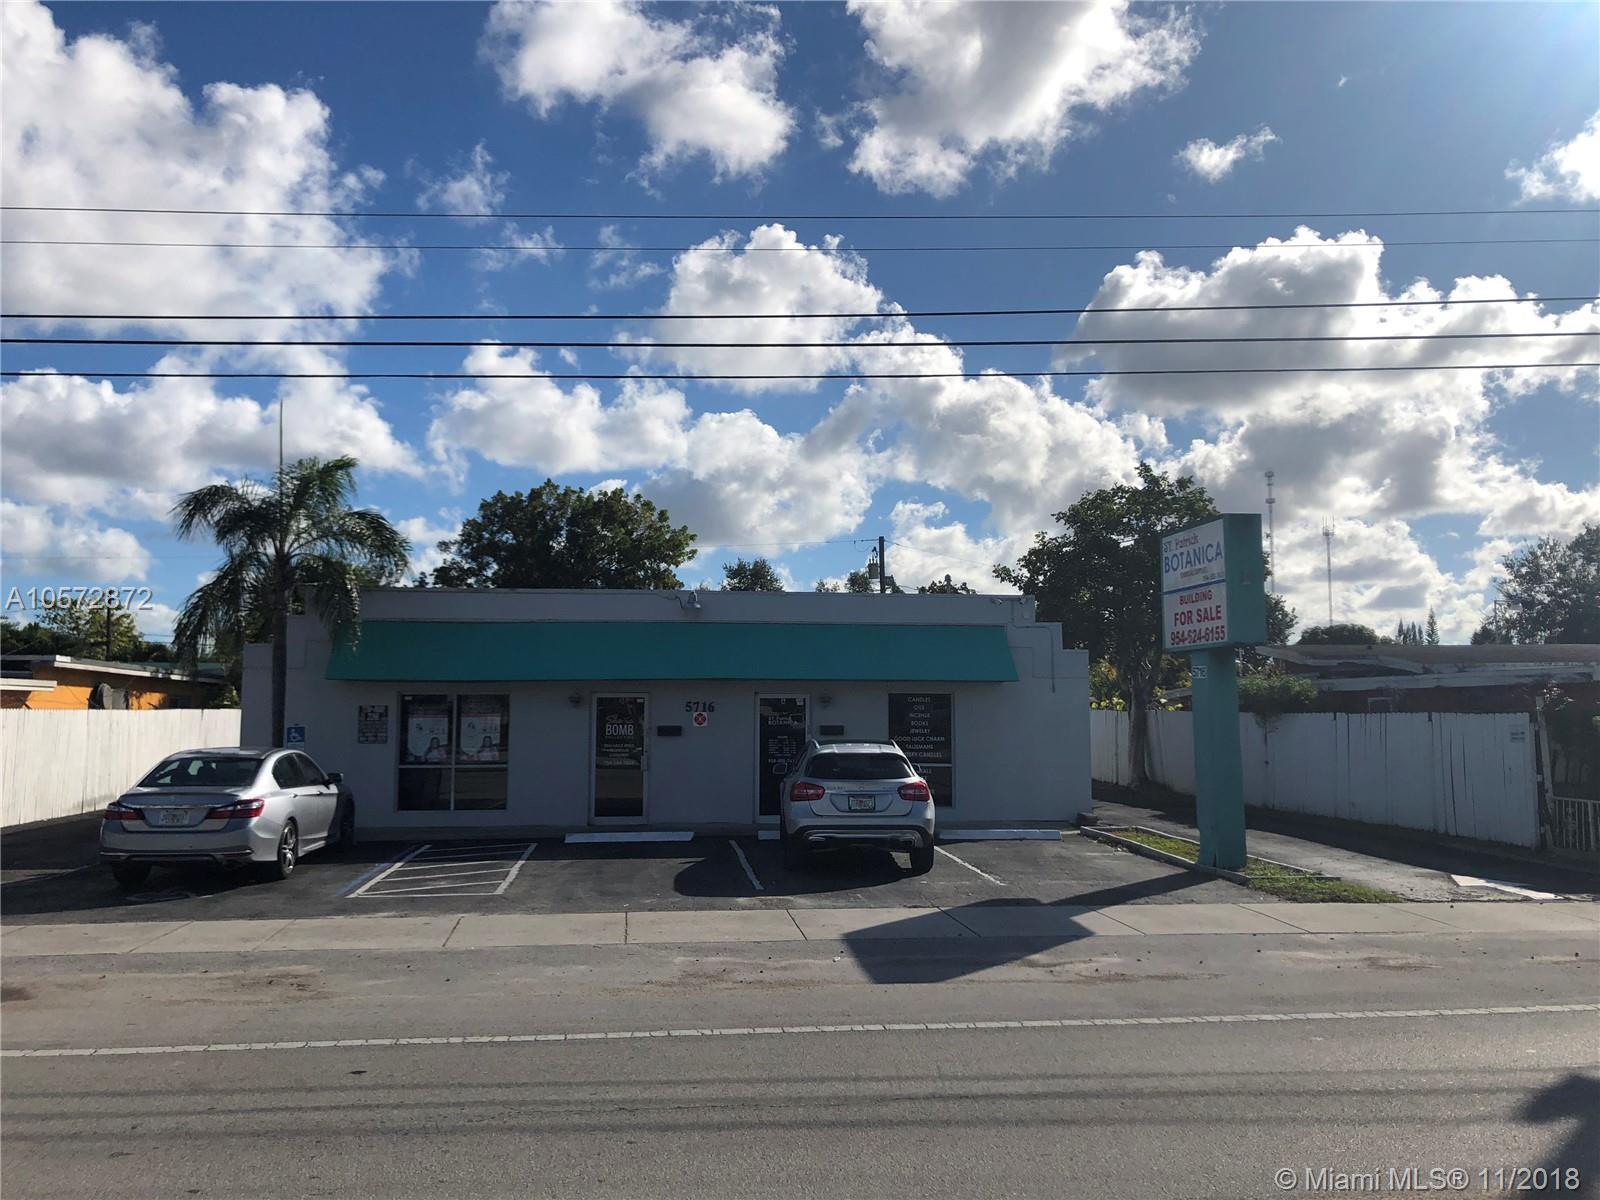 5716  Hallandale Beach Blvd  For Sale A10572872, FL